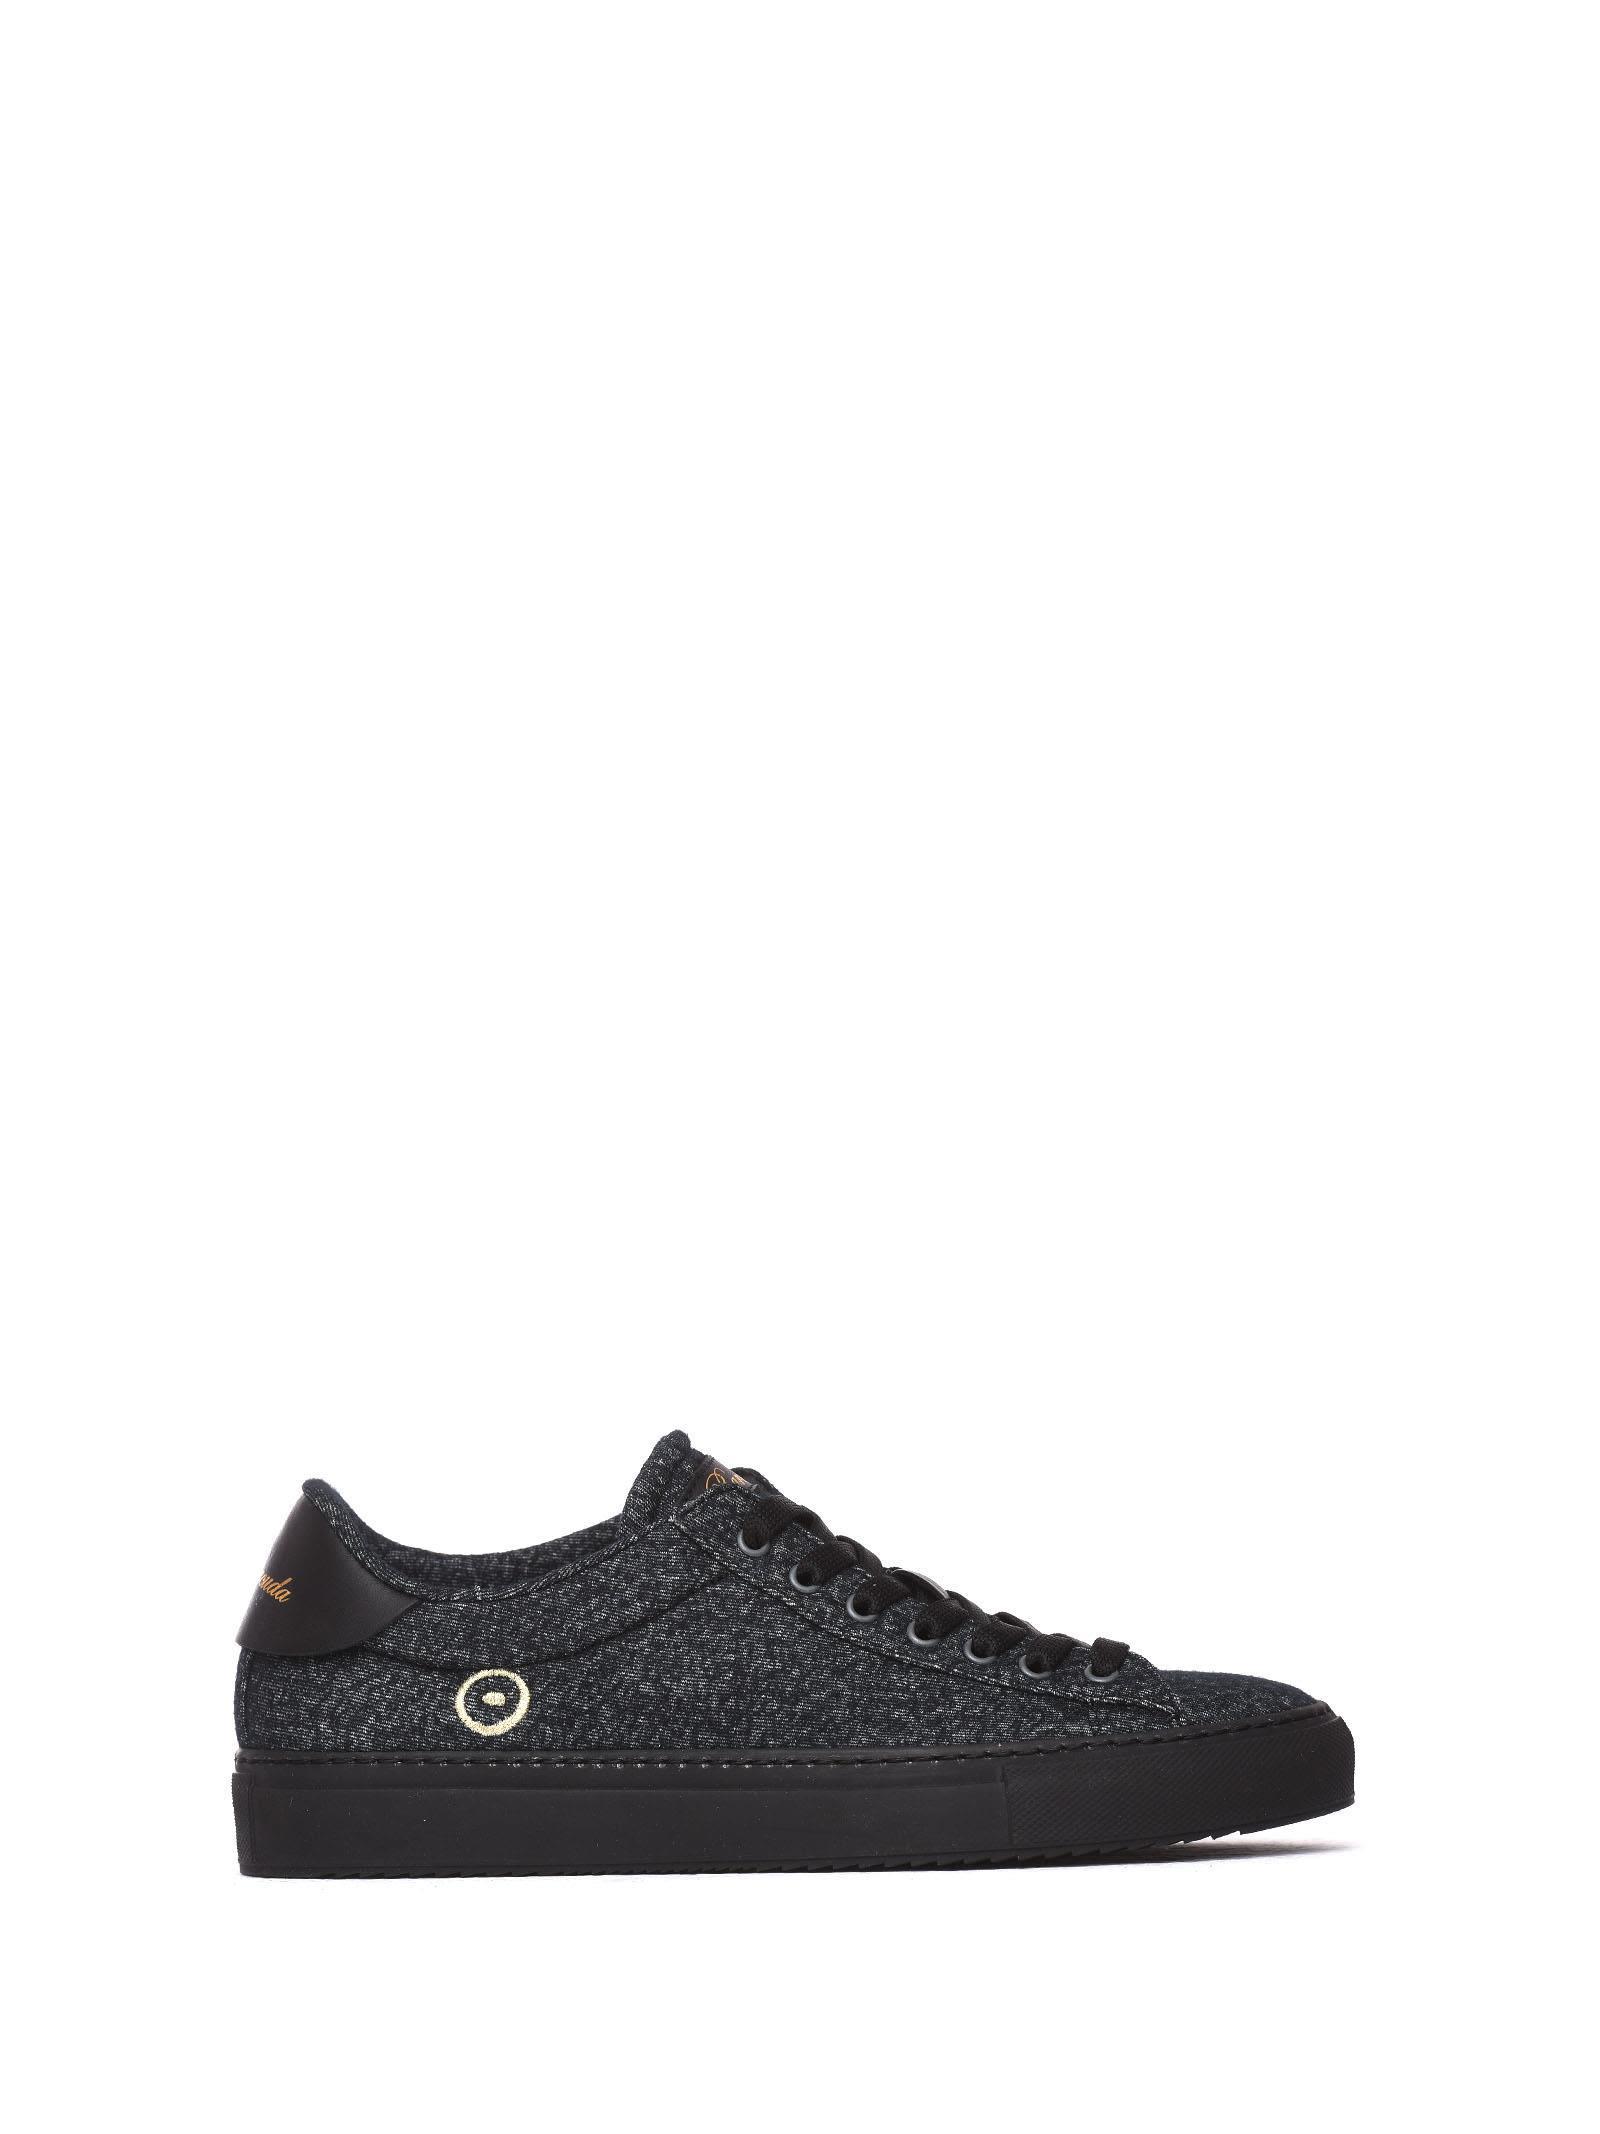 Barracuda Breathable/dry Sneaker By Reda Active Black In Nero